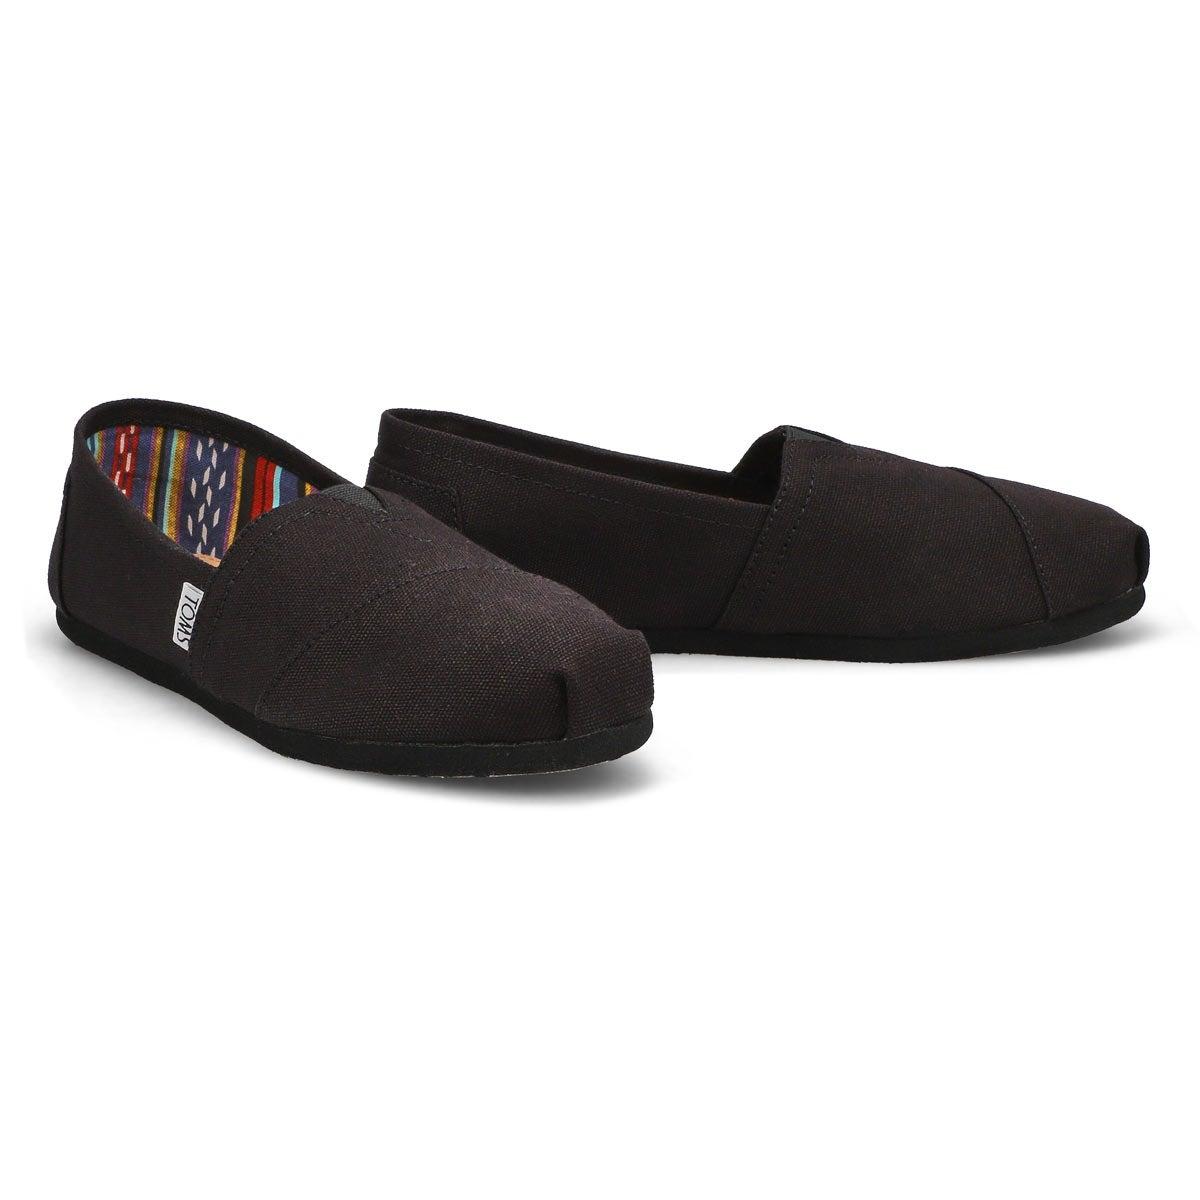 Lds Classic black/black canvas loafer